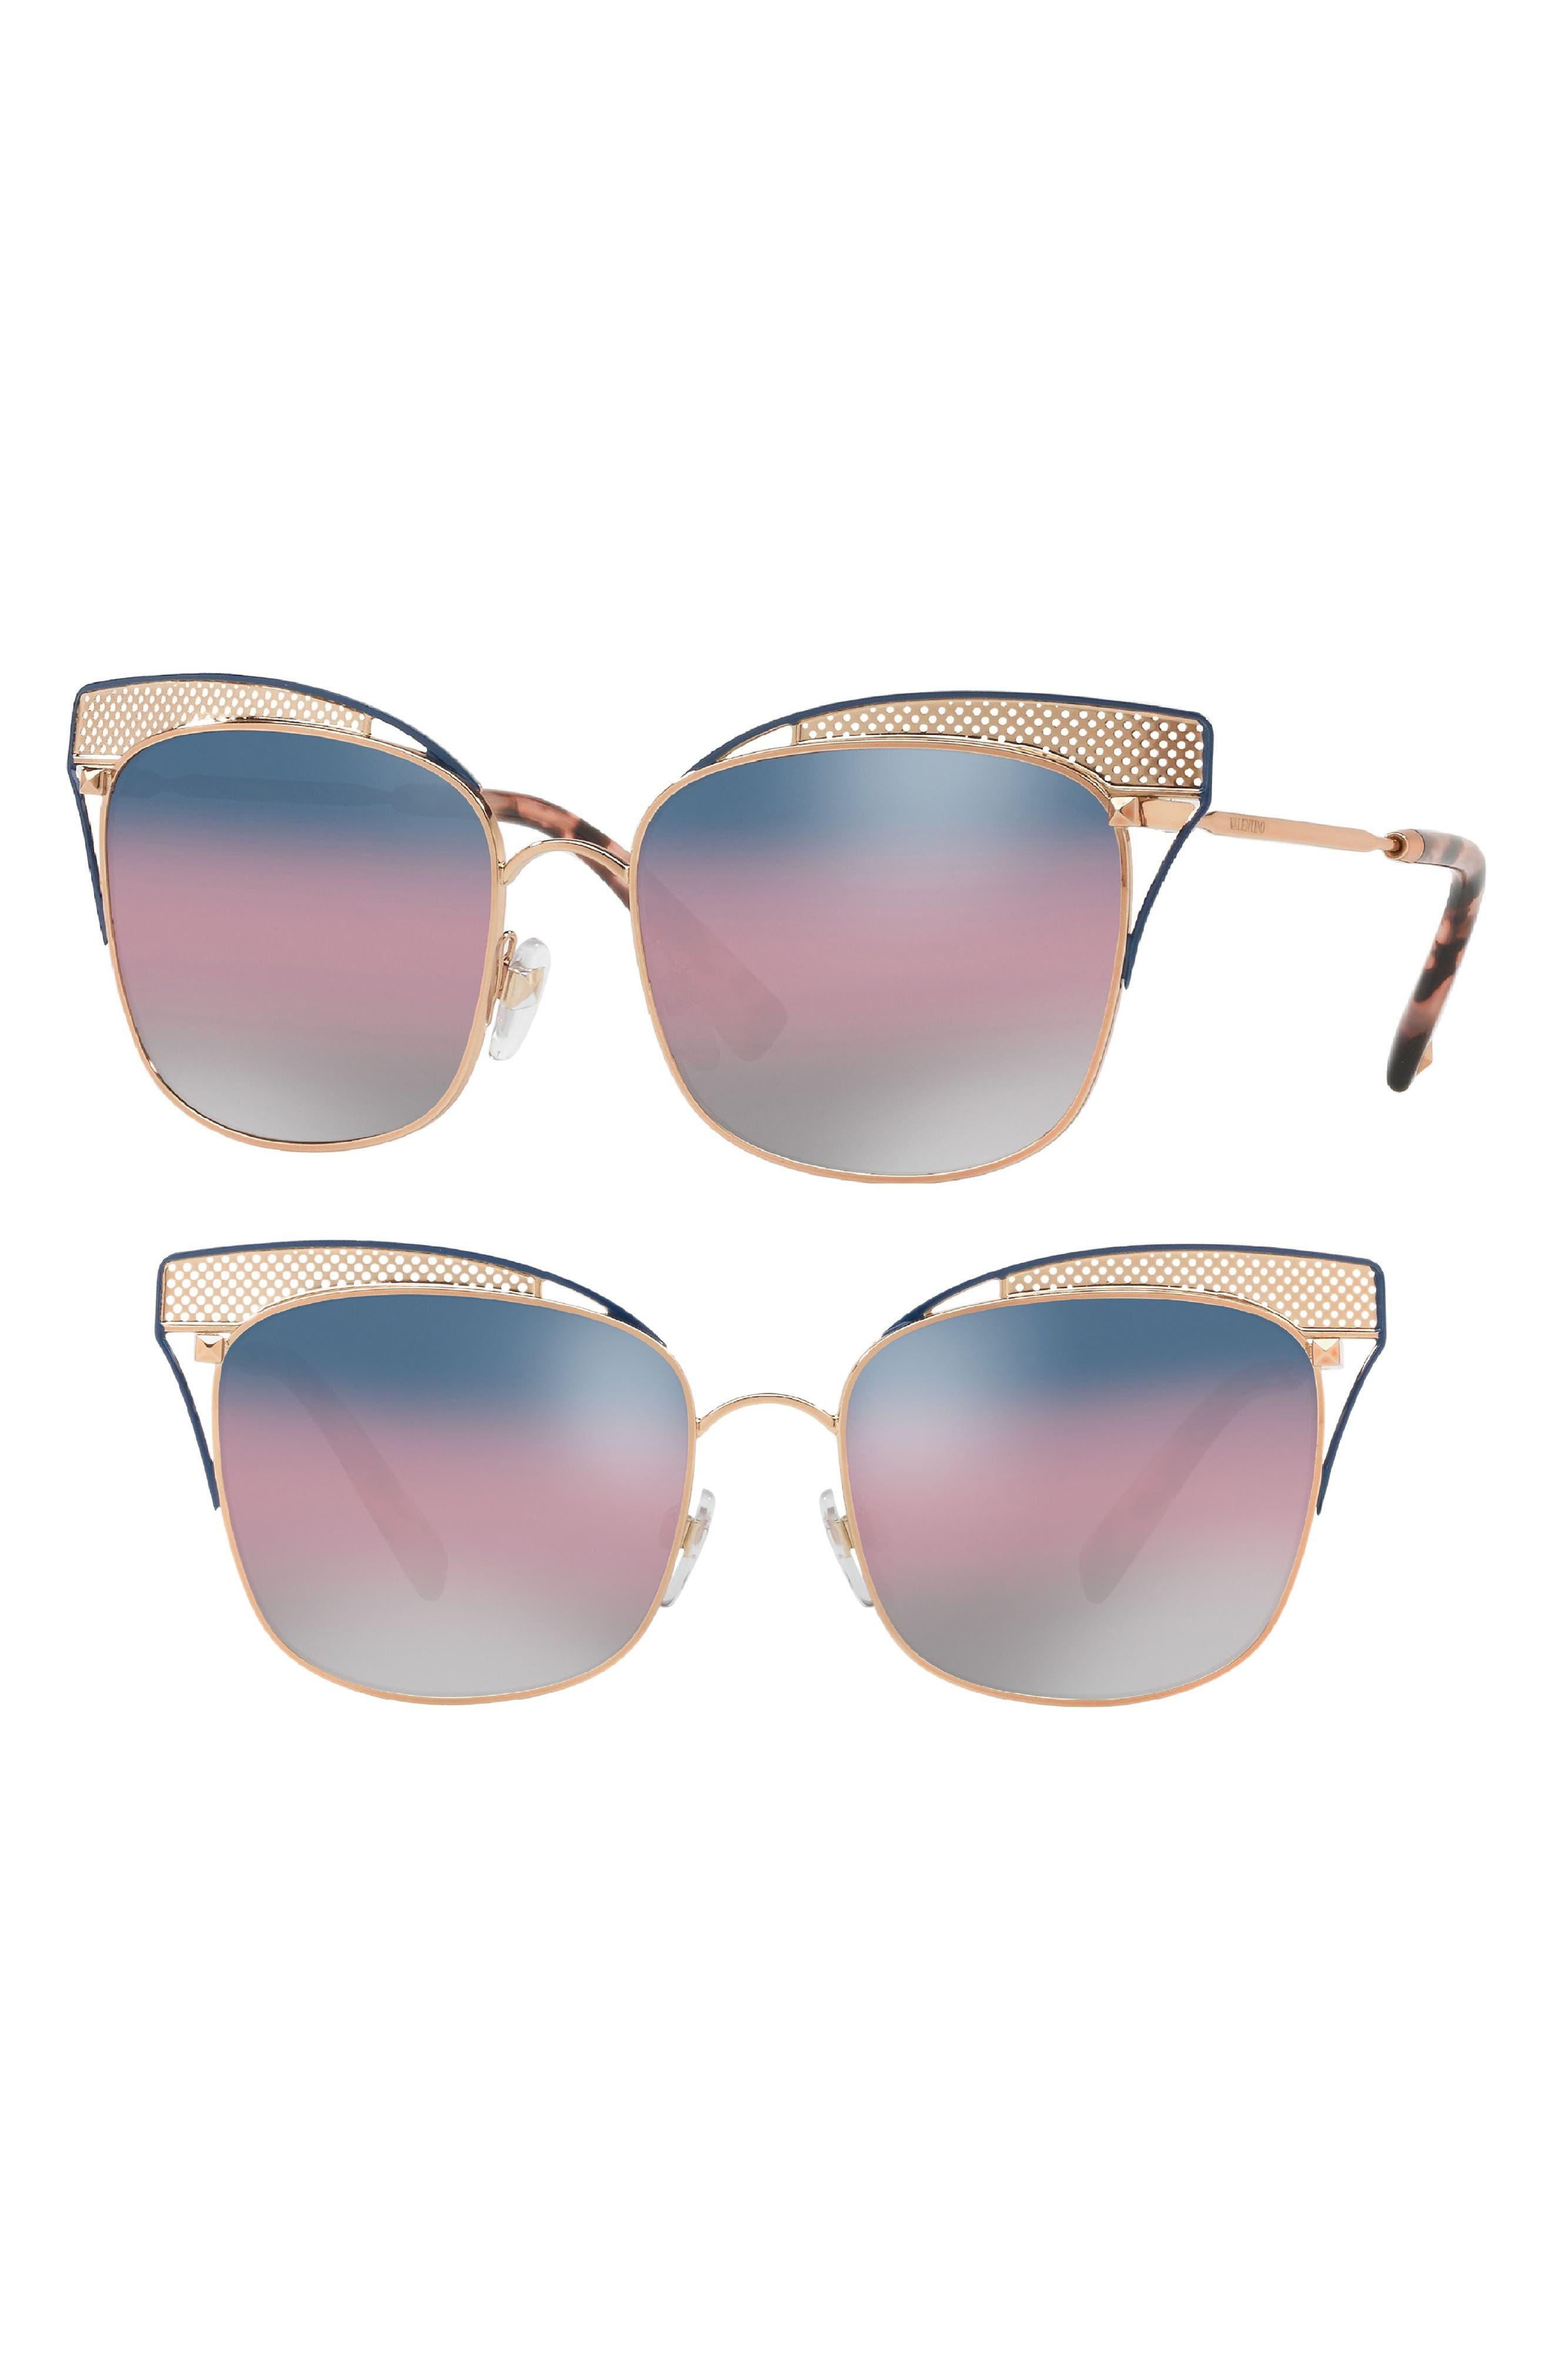 55mm Cat Eye Sunglasses,                         Main,                         color,